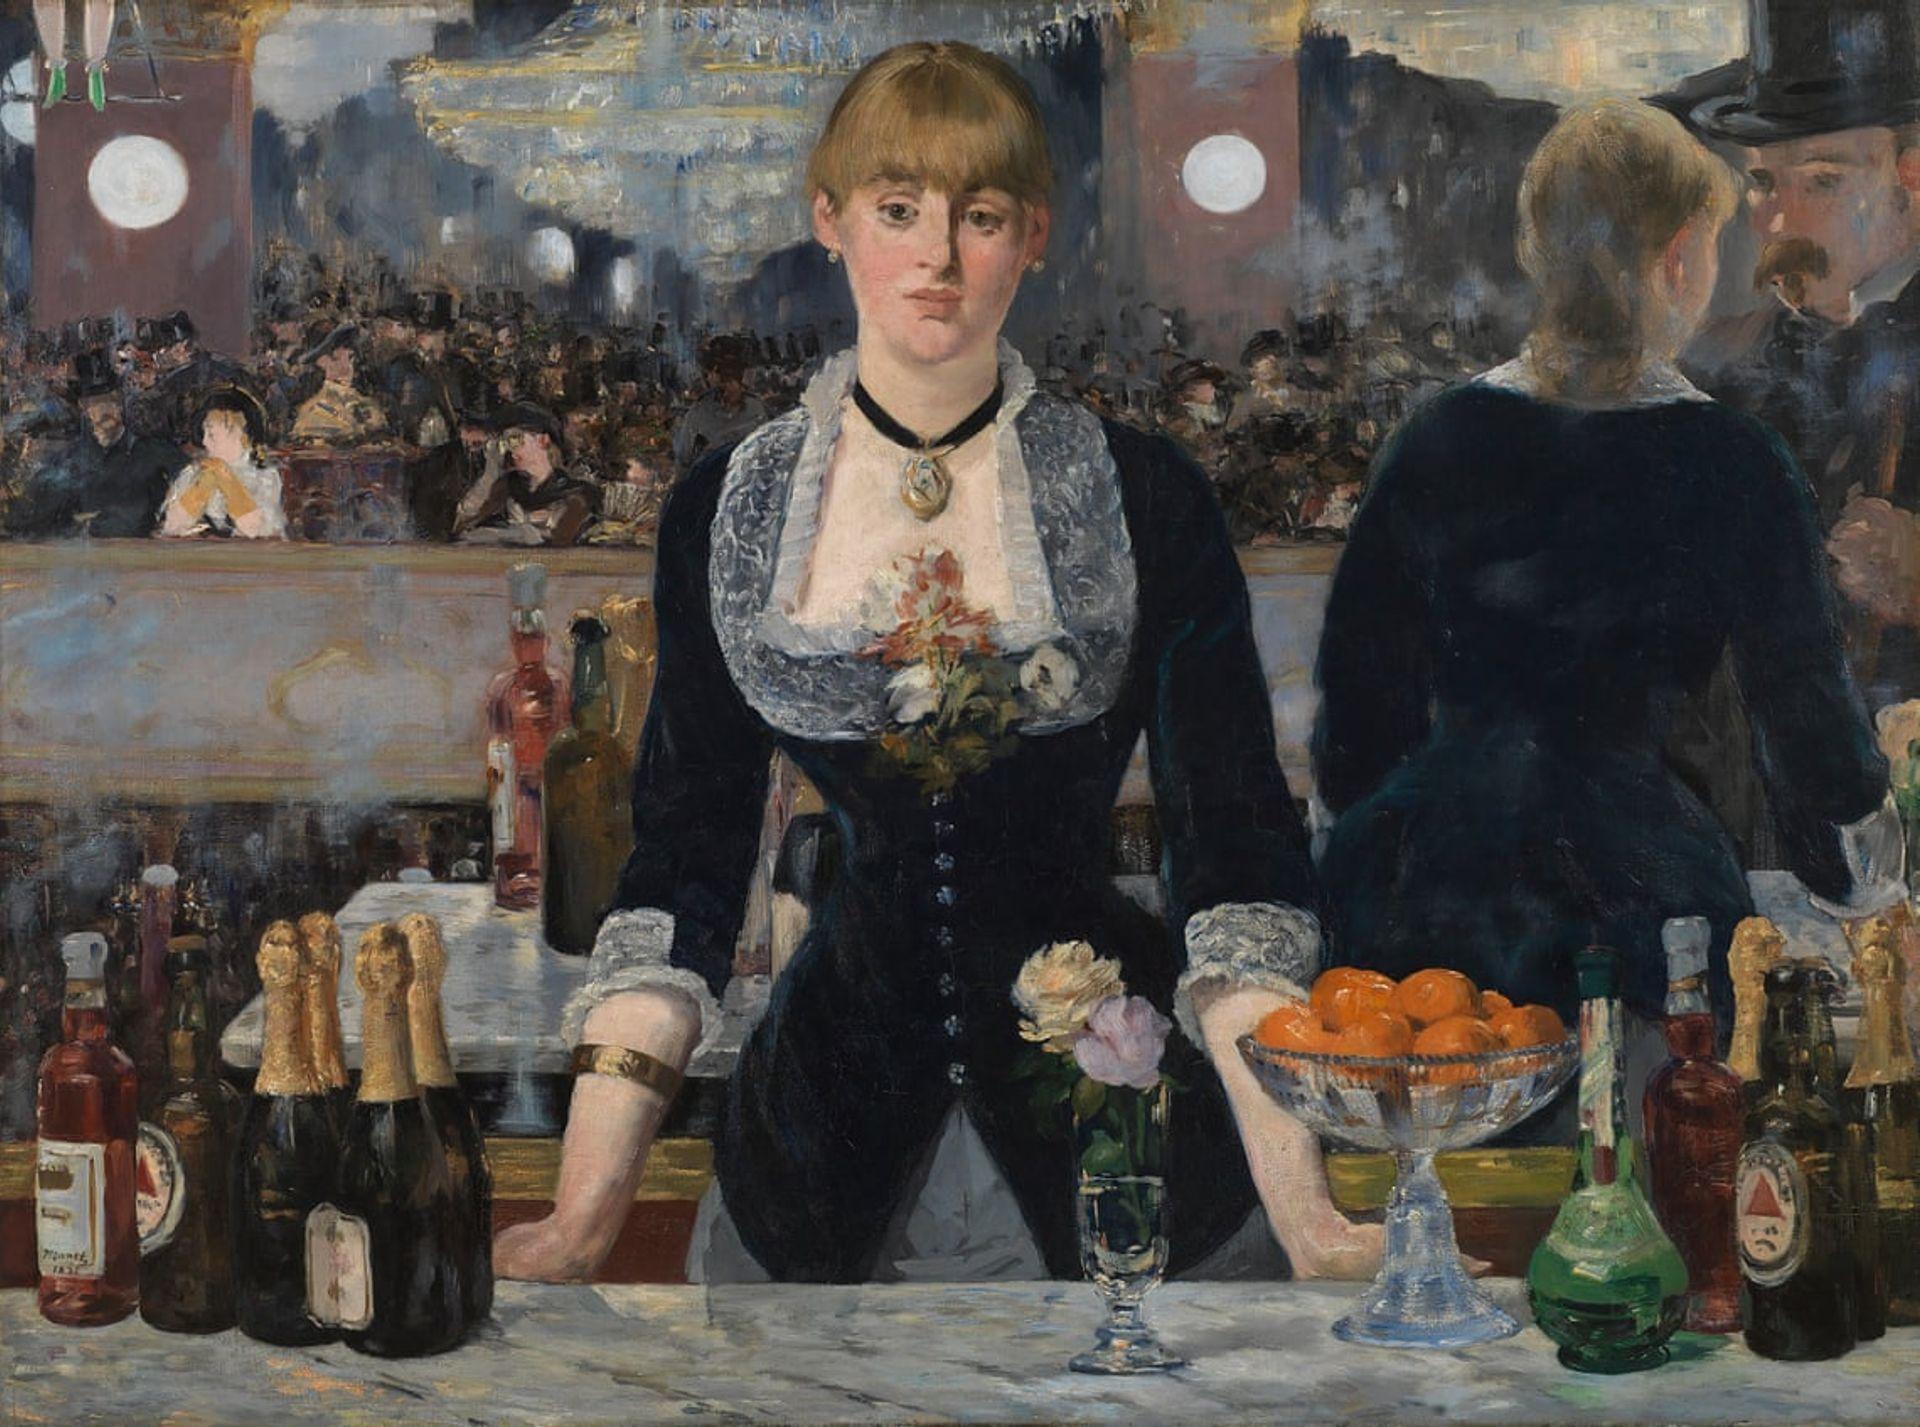 Edouard Manet's A Bar at the Folies-Bergère (1882) Samuel Courtauld Trust/Courtauld